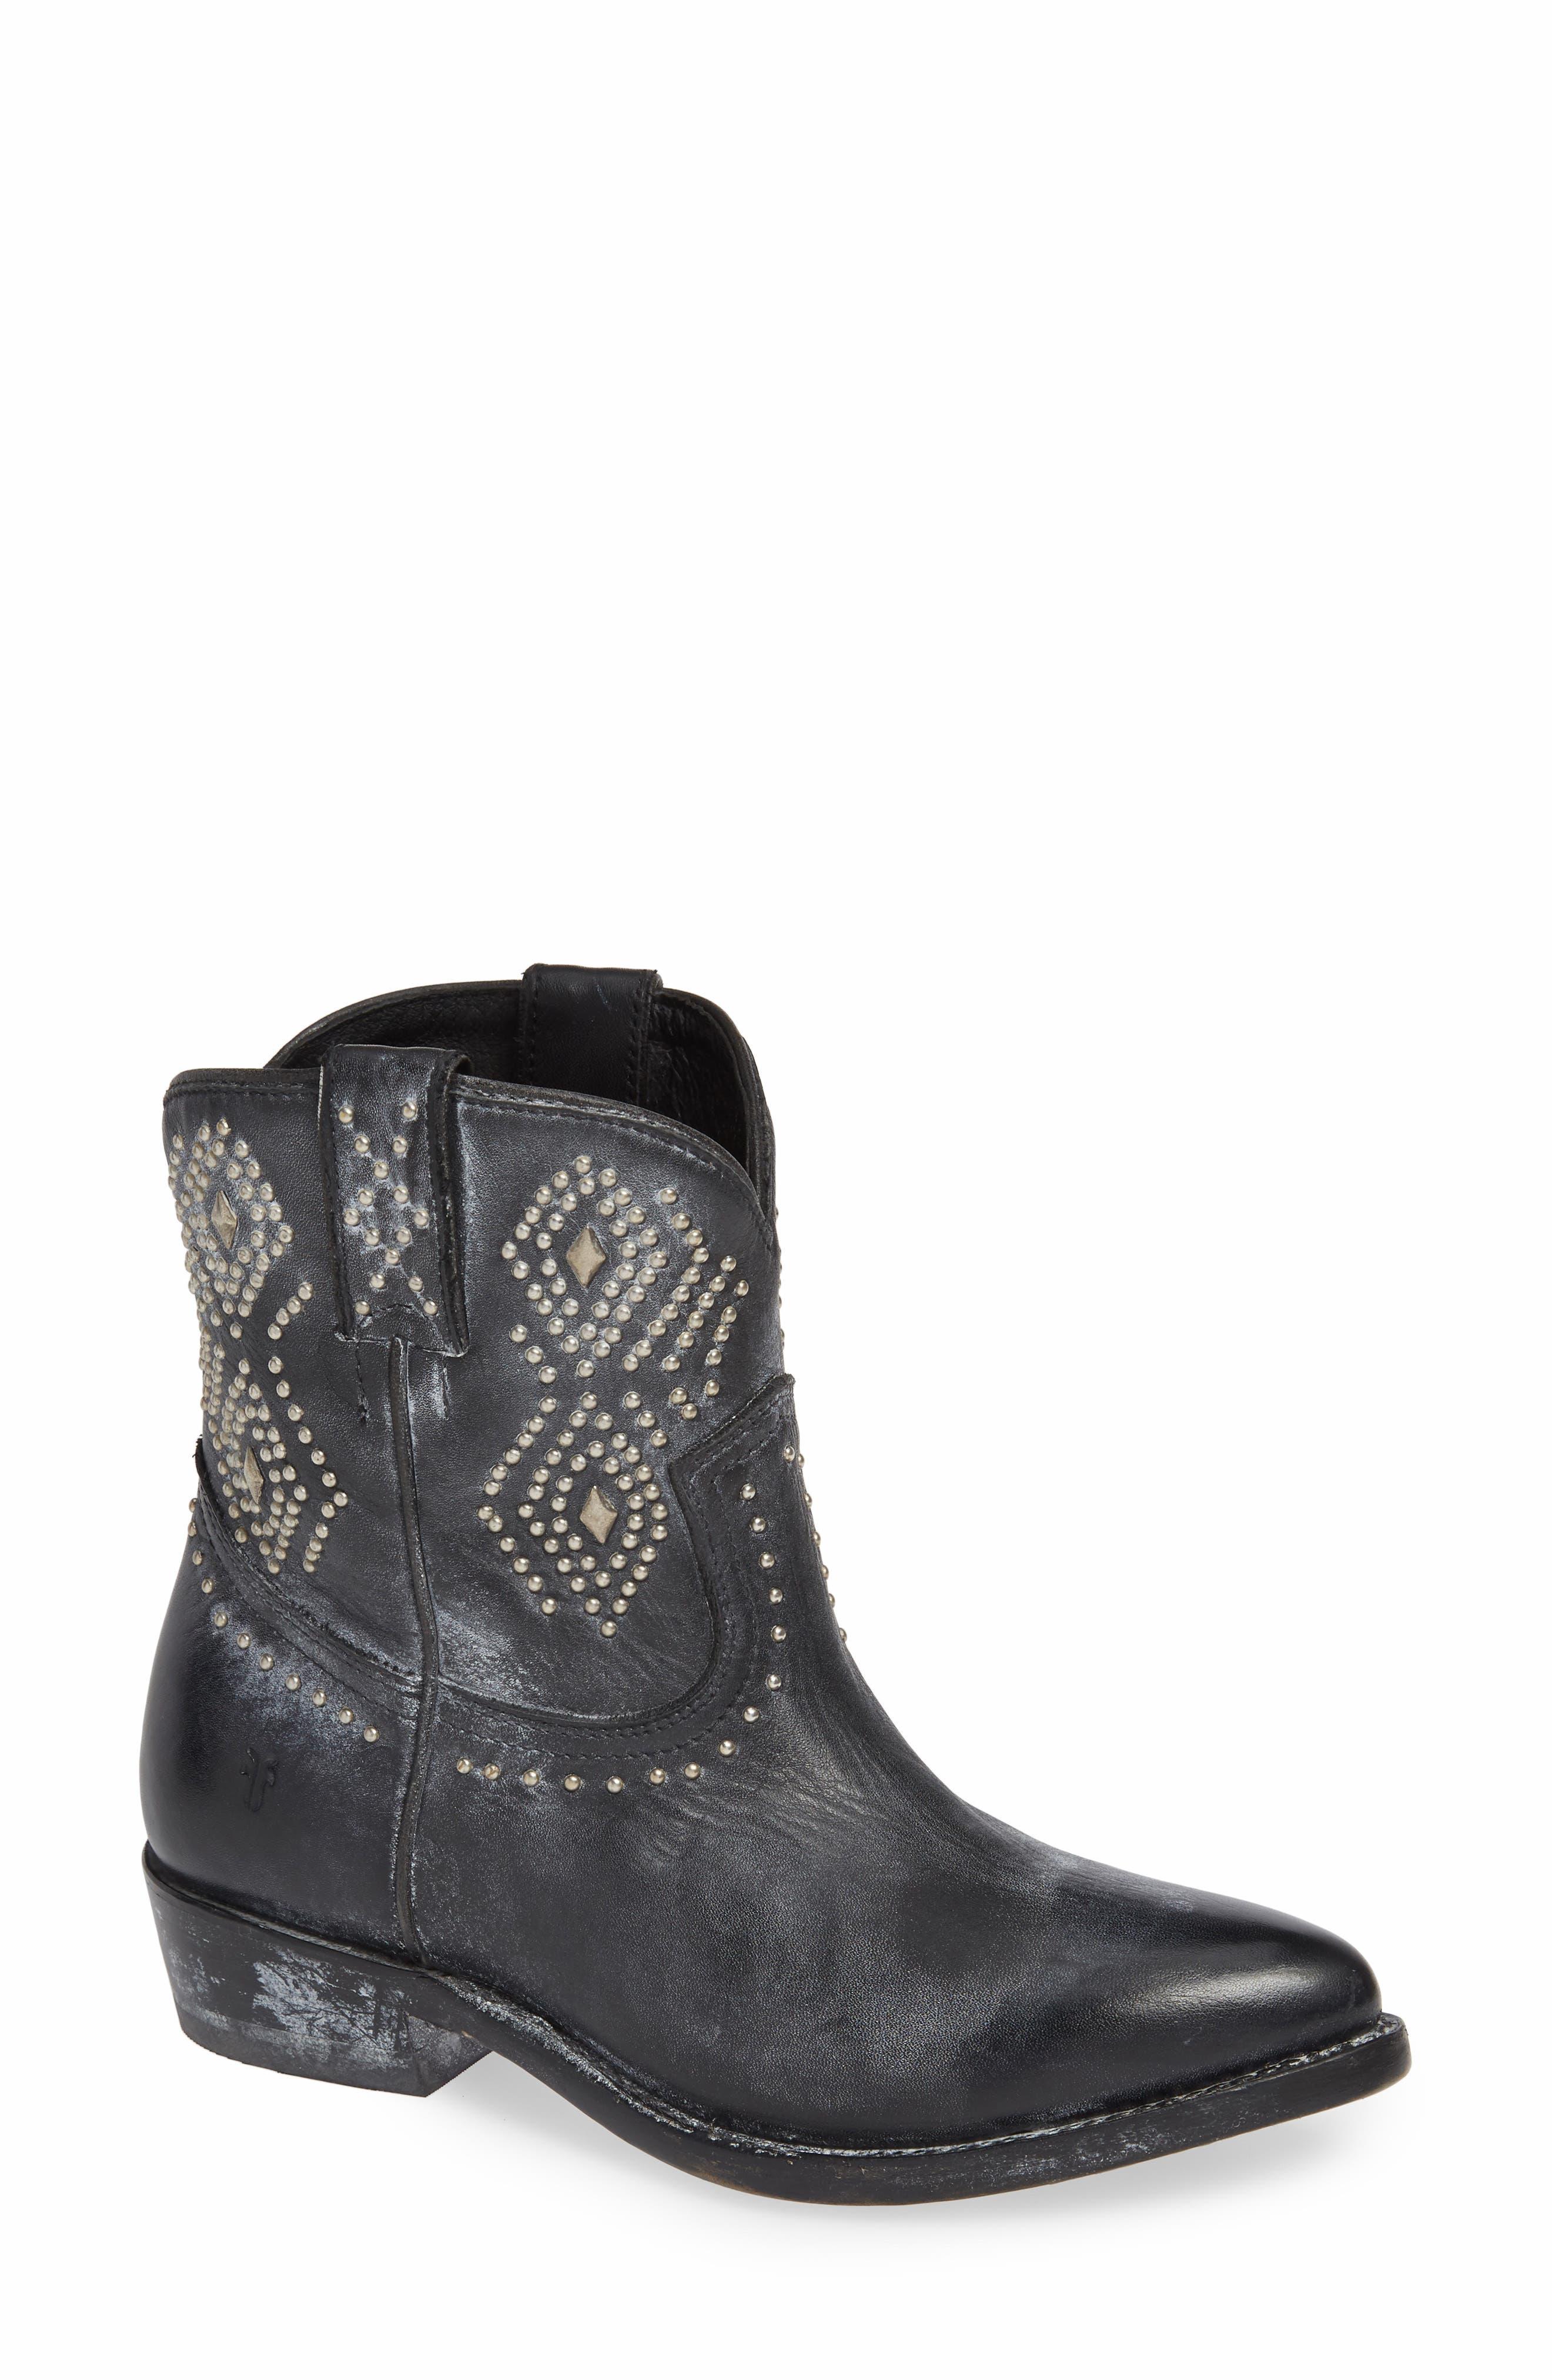 Frye Billy Stud Short Western Boot, Black